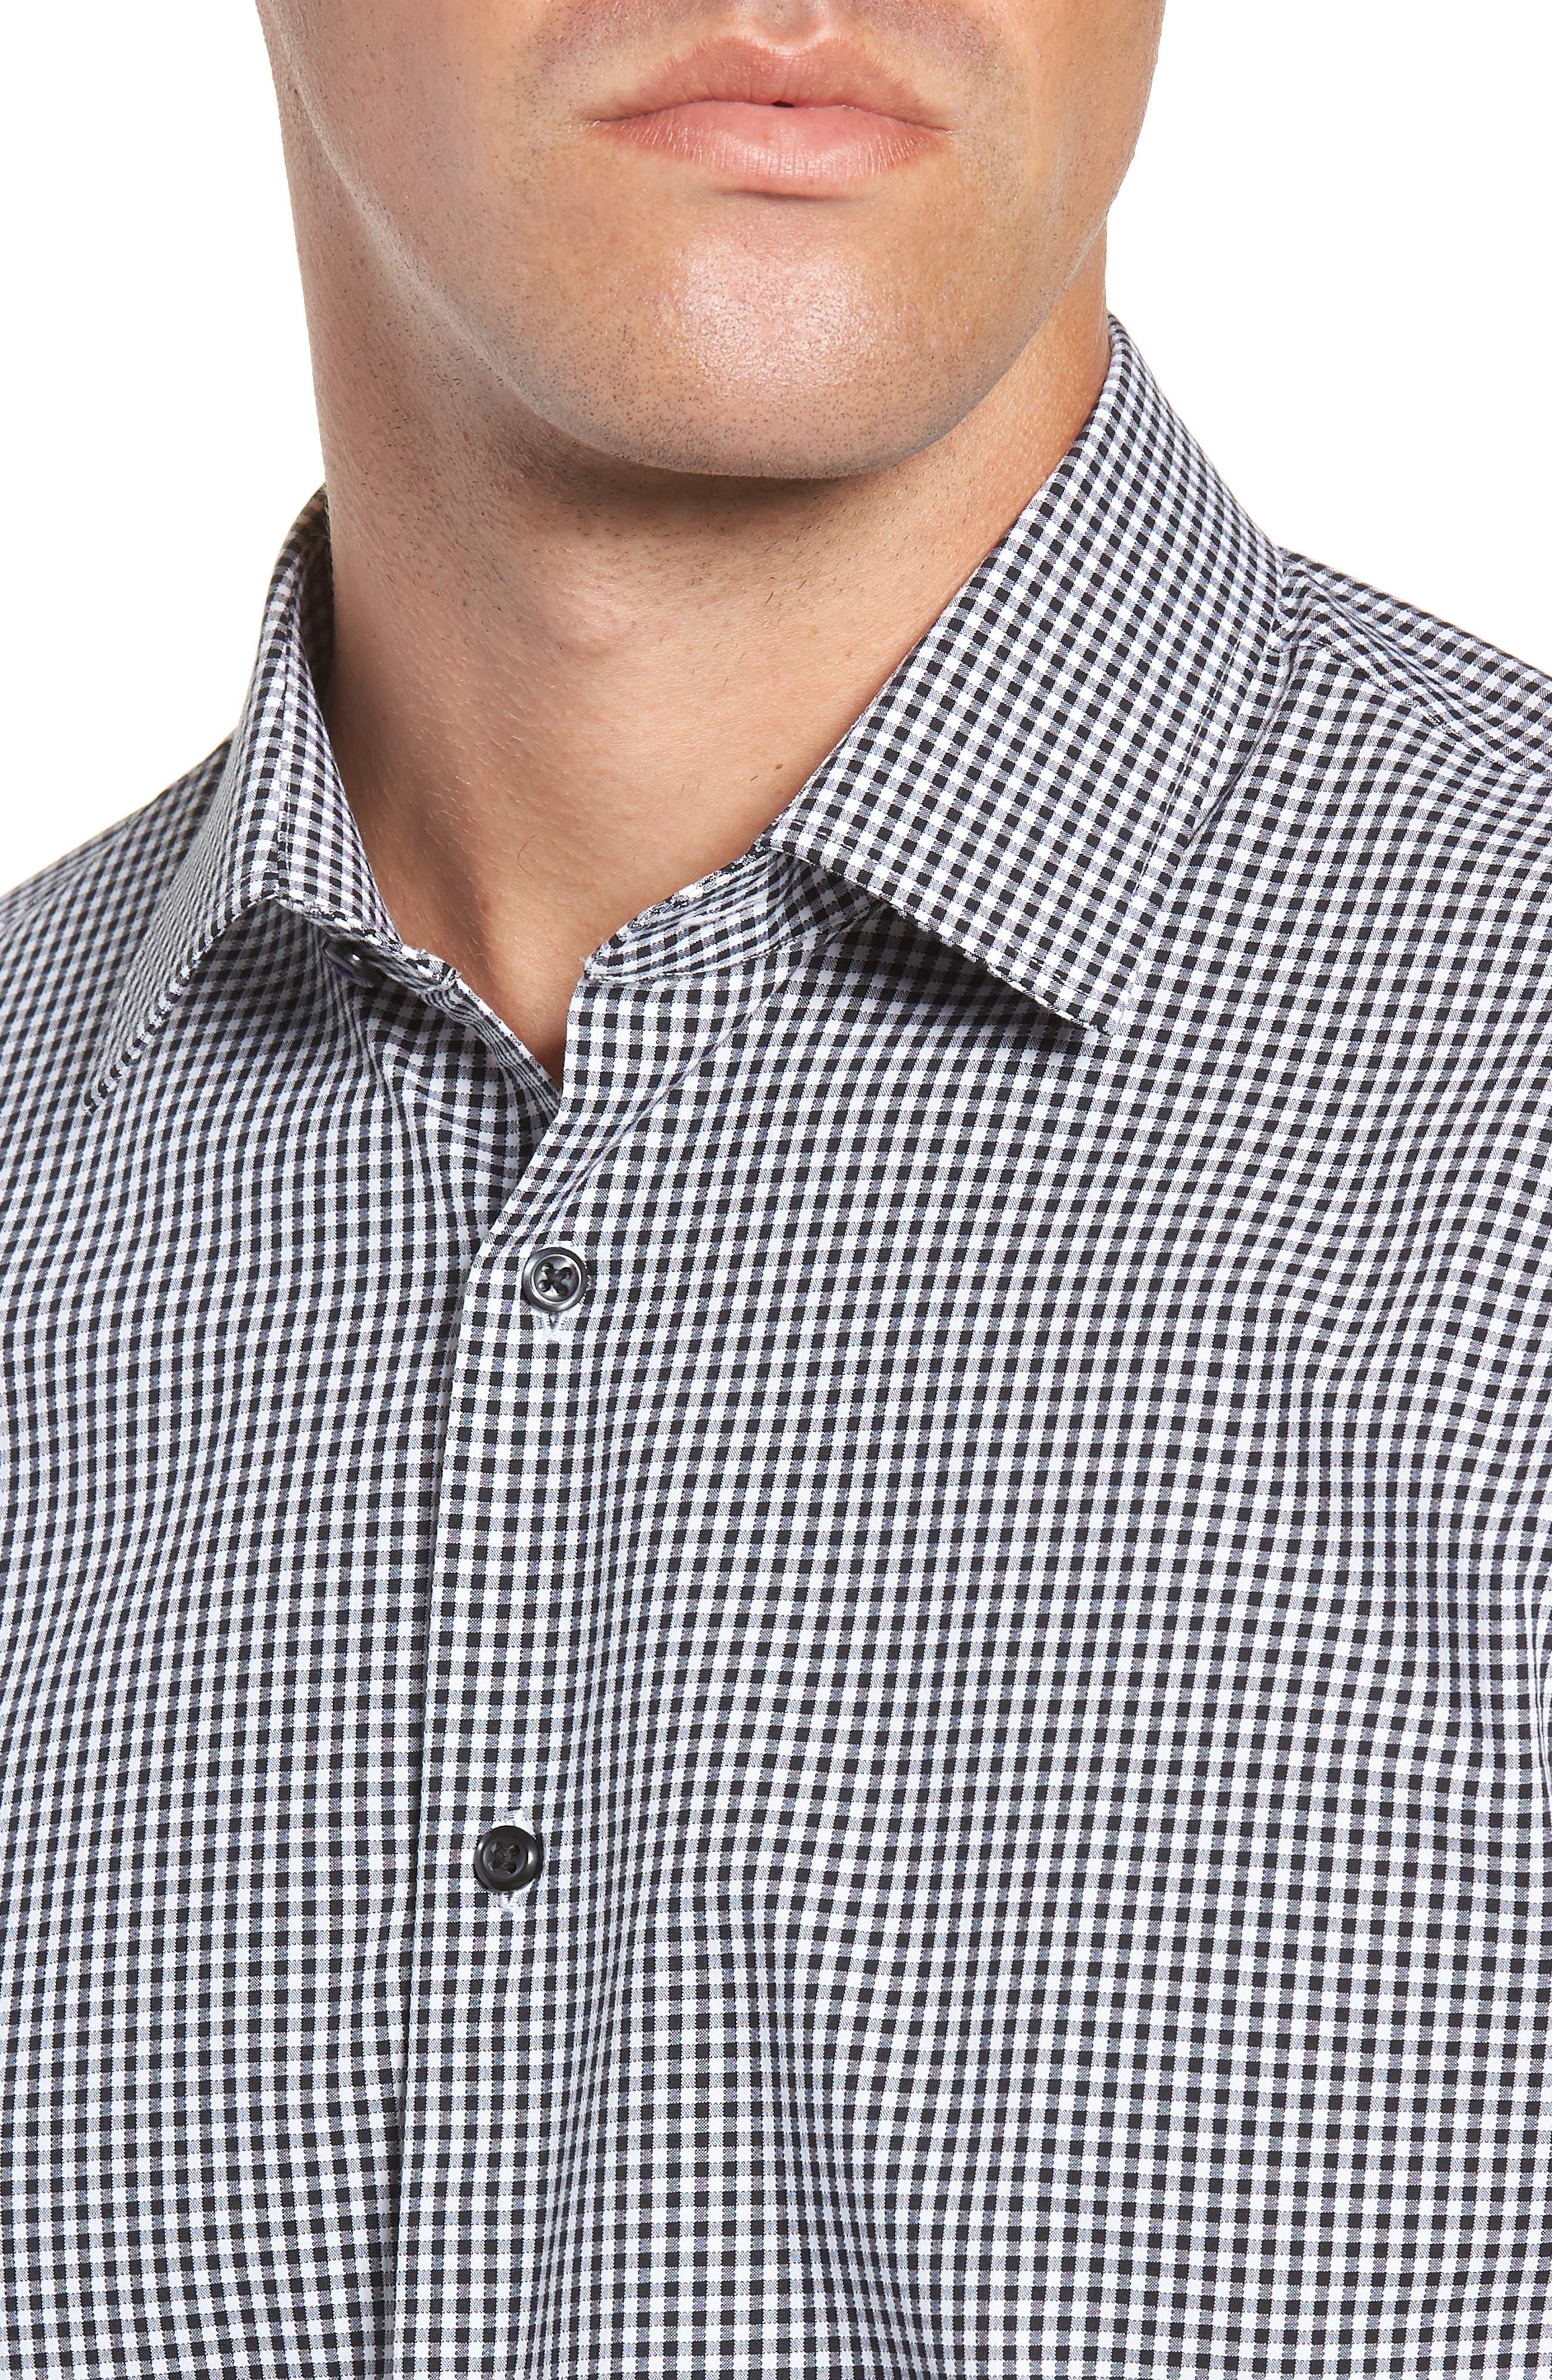 Tech-Smart Trim Fit Stretch Check Dress Shirt,                             Alternate thumbnail 2, color,                             BLACK ROCK